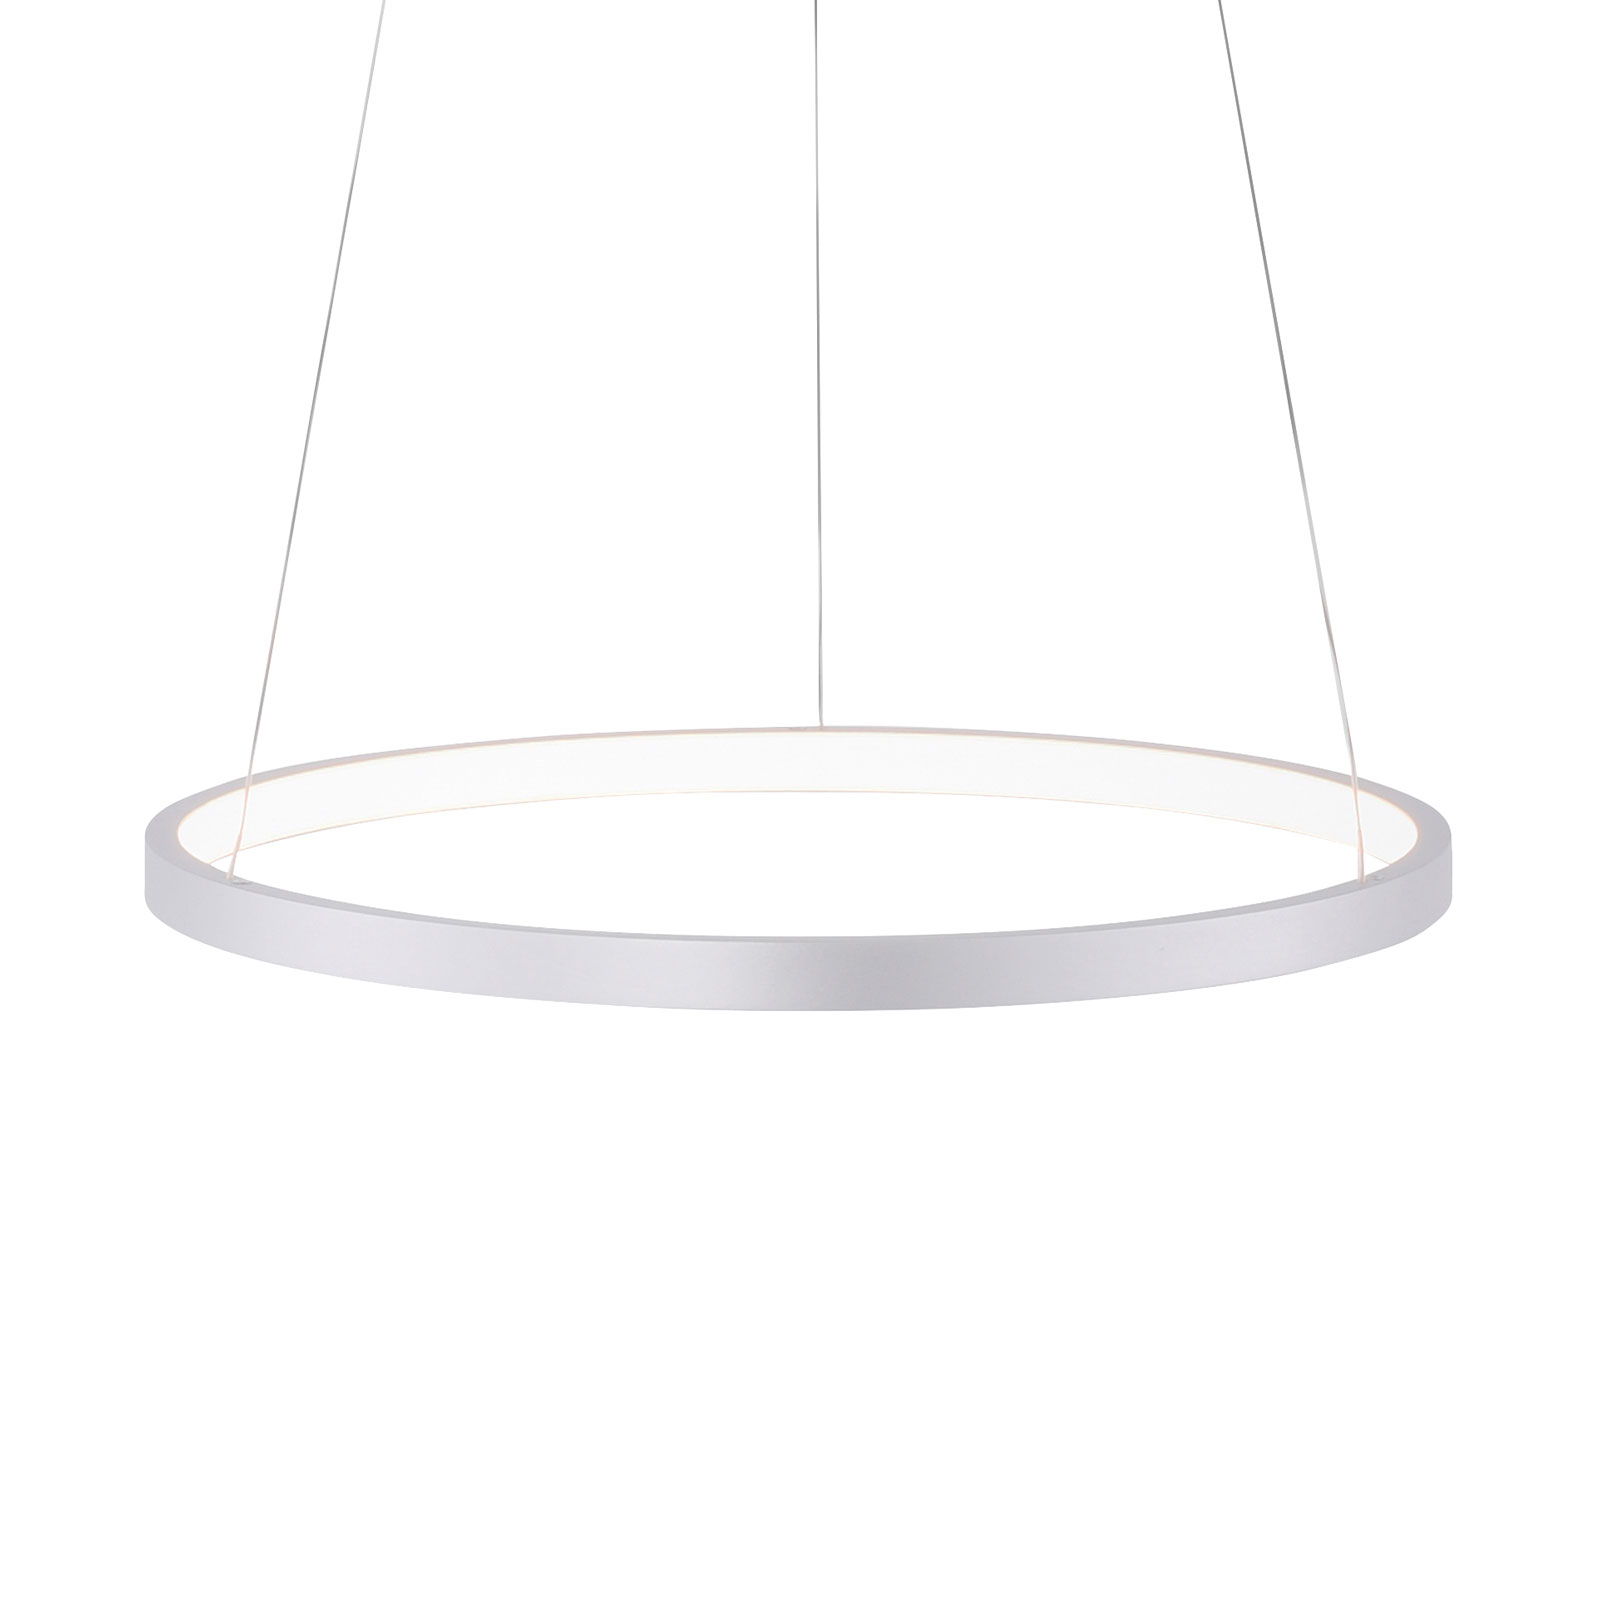 LED-pendellampe Circle, sølv, Ø 39 cm